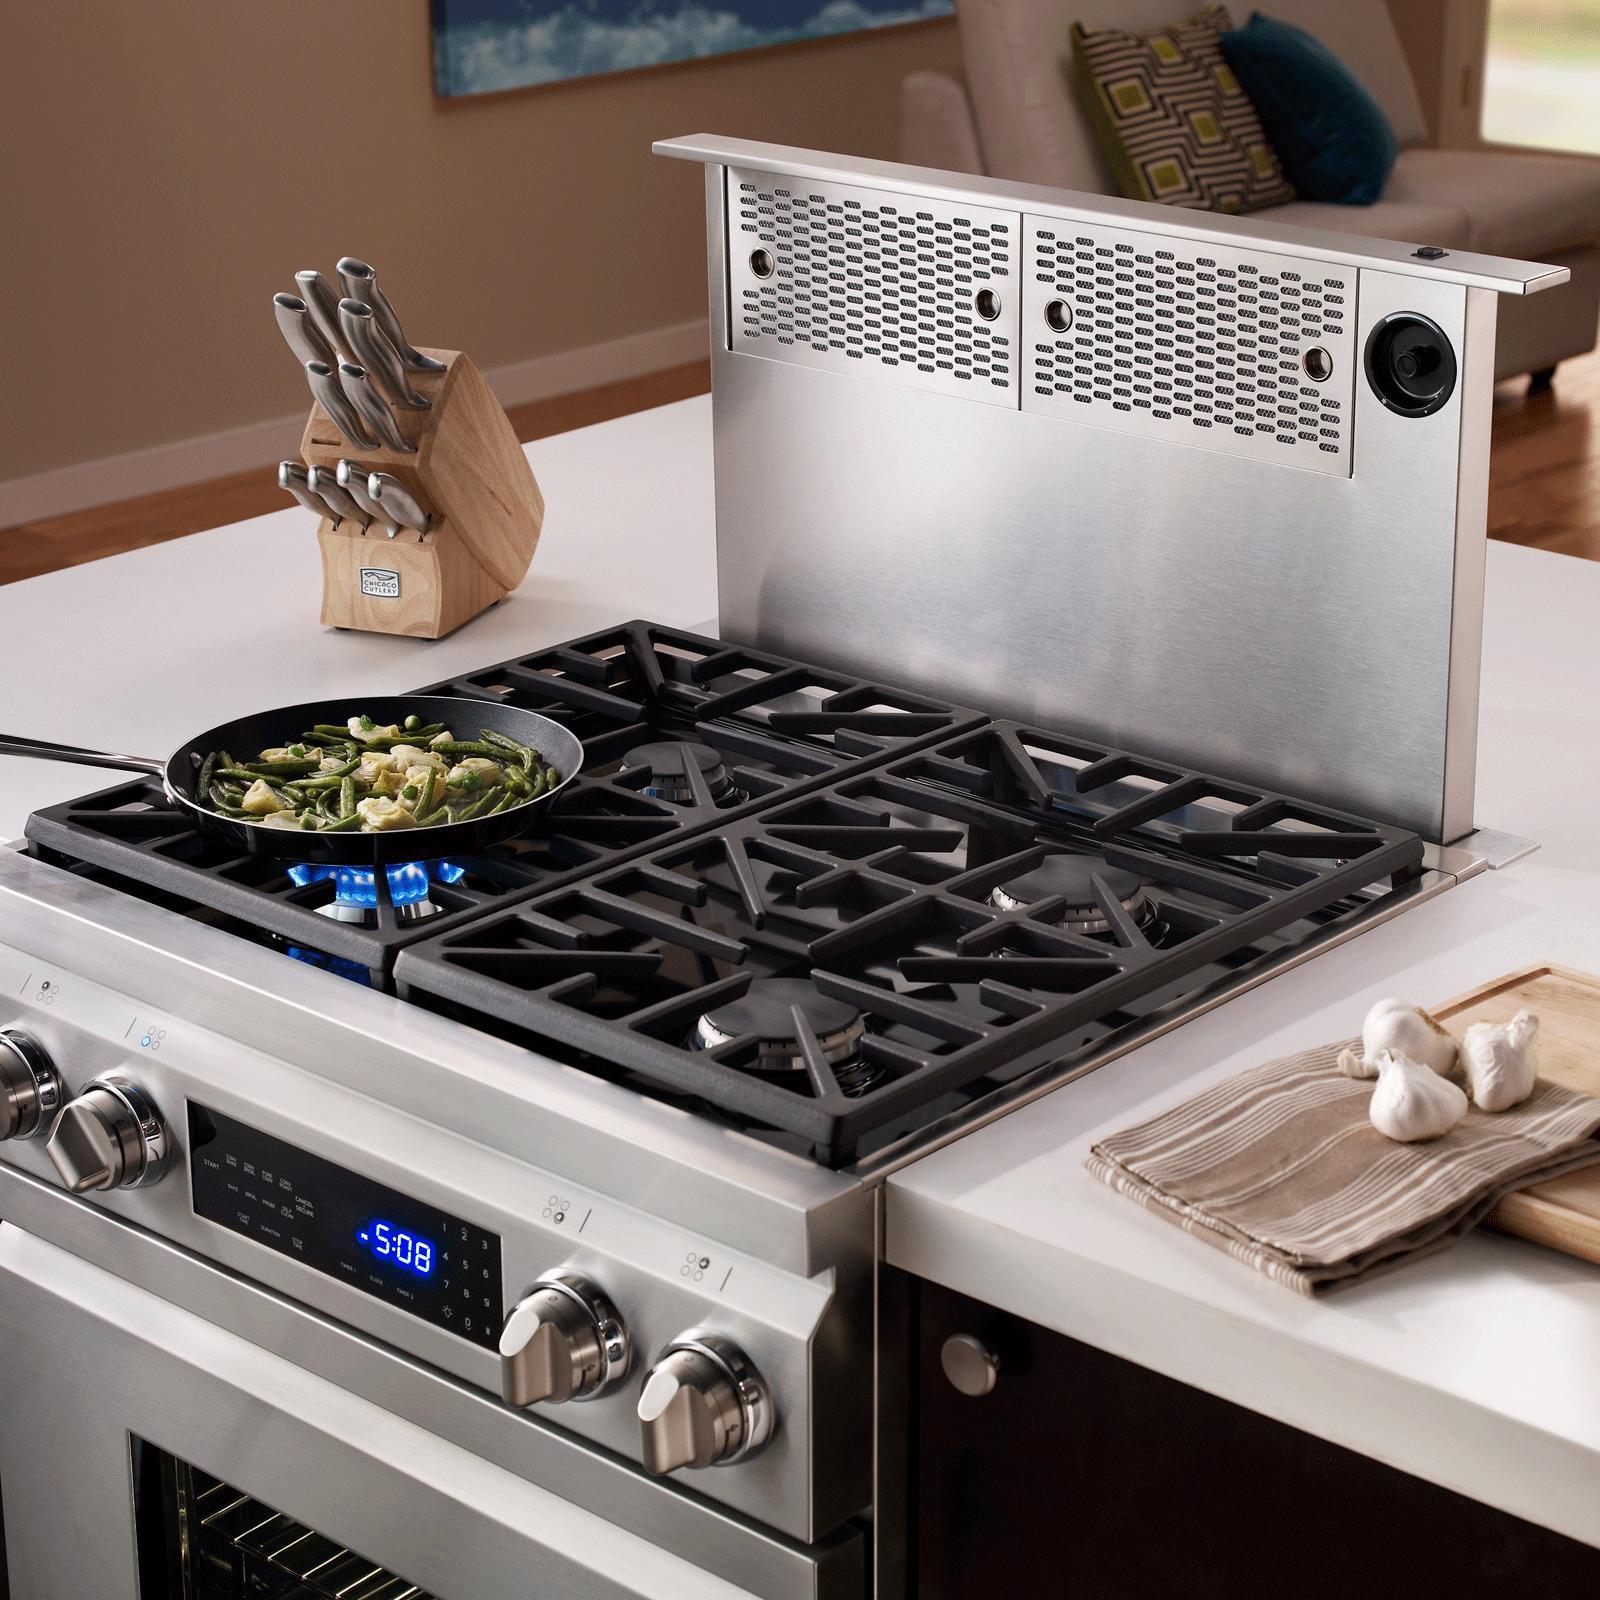 Renaissance 48 46 36 30 Downdrafts Kitchen Island With Stove Kitchen Design Small Best Appliances